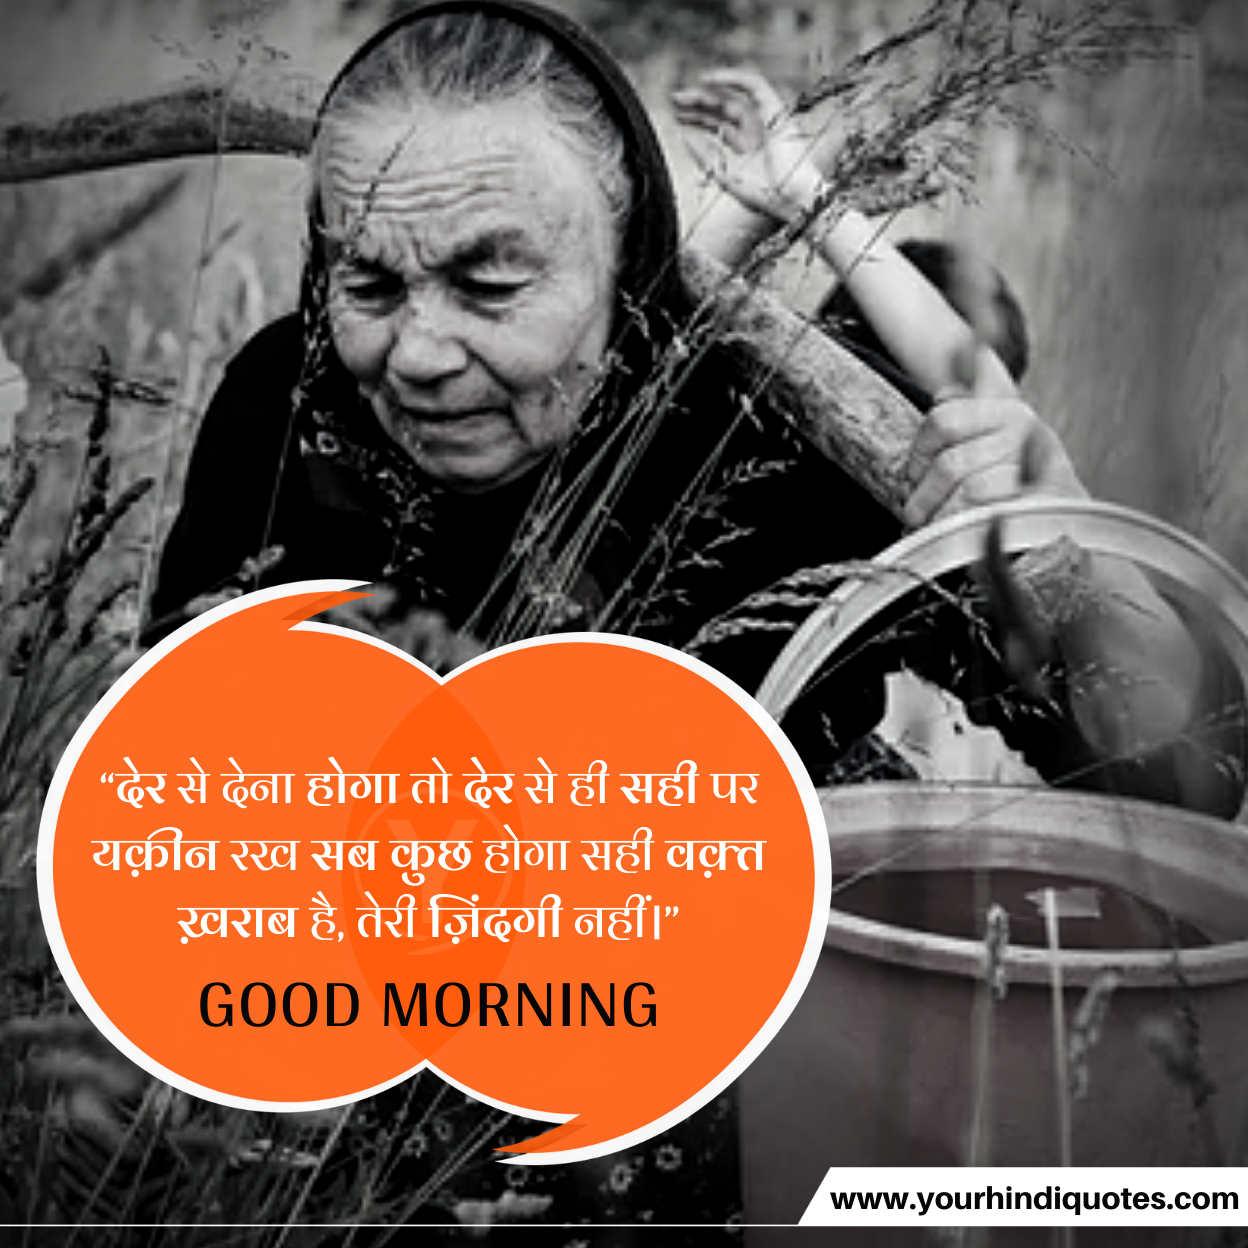 Best Hindi Morning Images